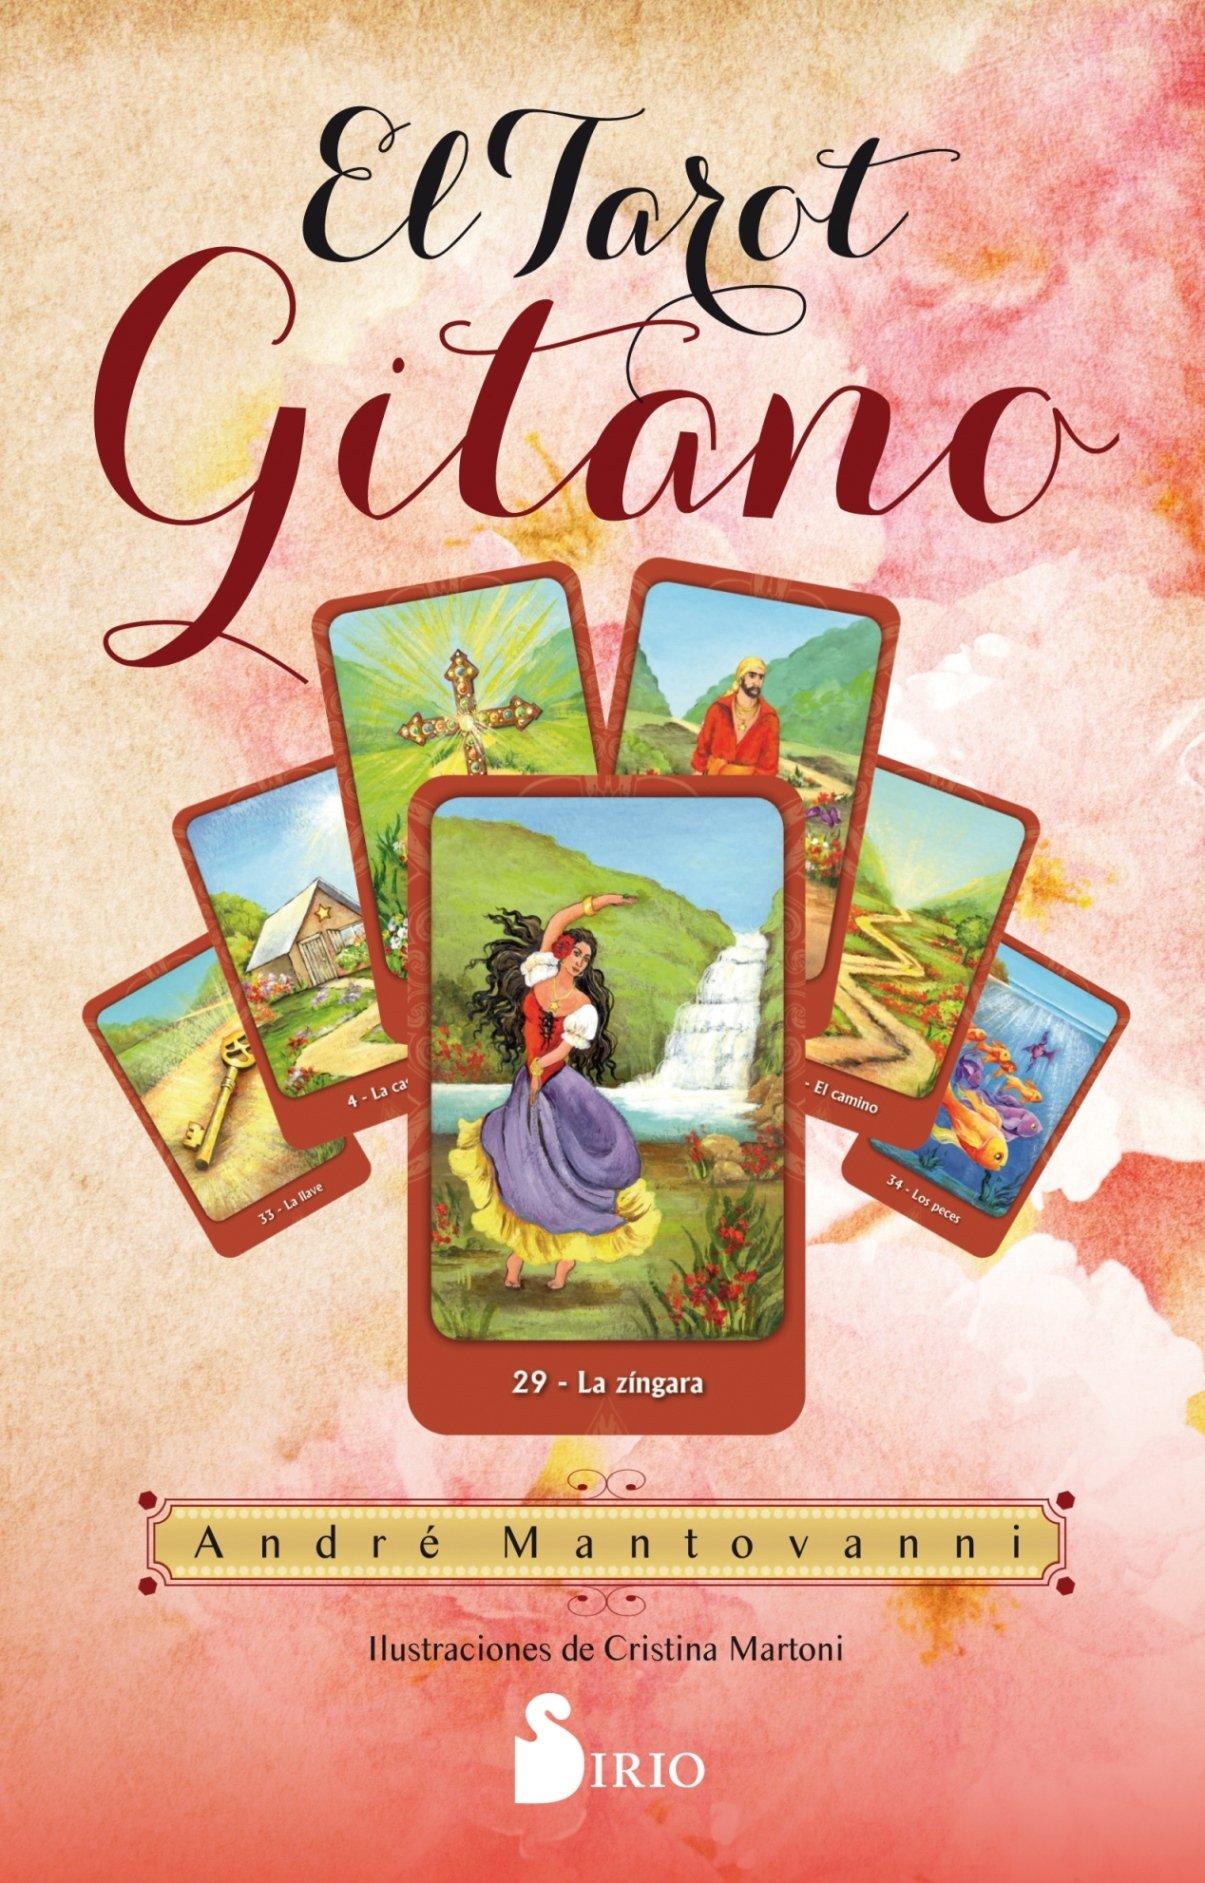 El tarot gitano (Spanish Edition): Andre Mantovanni ...